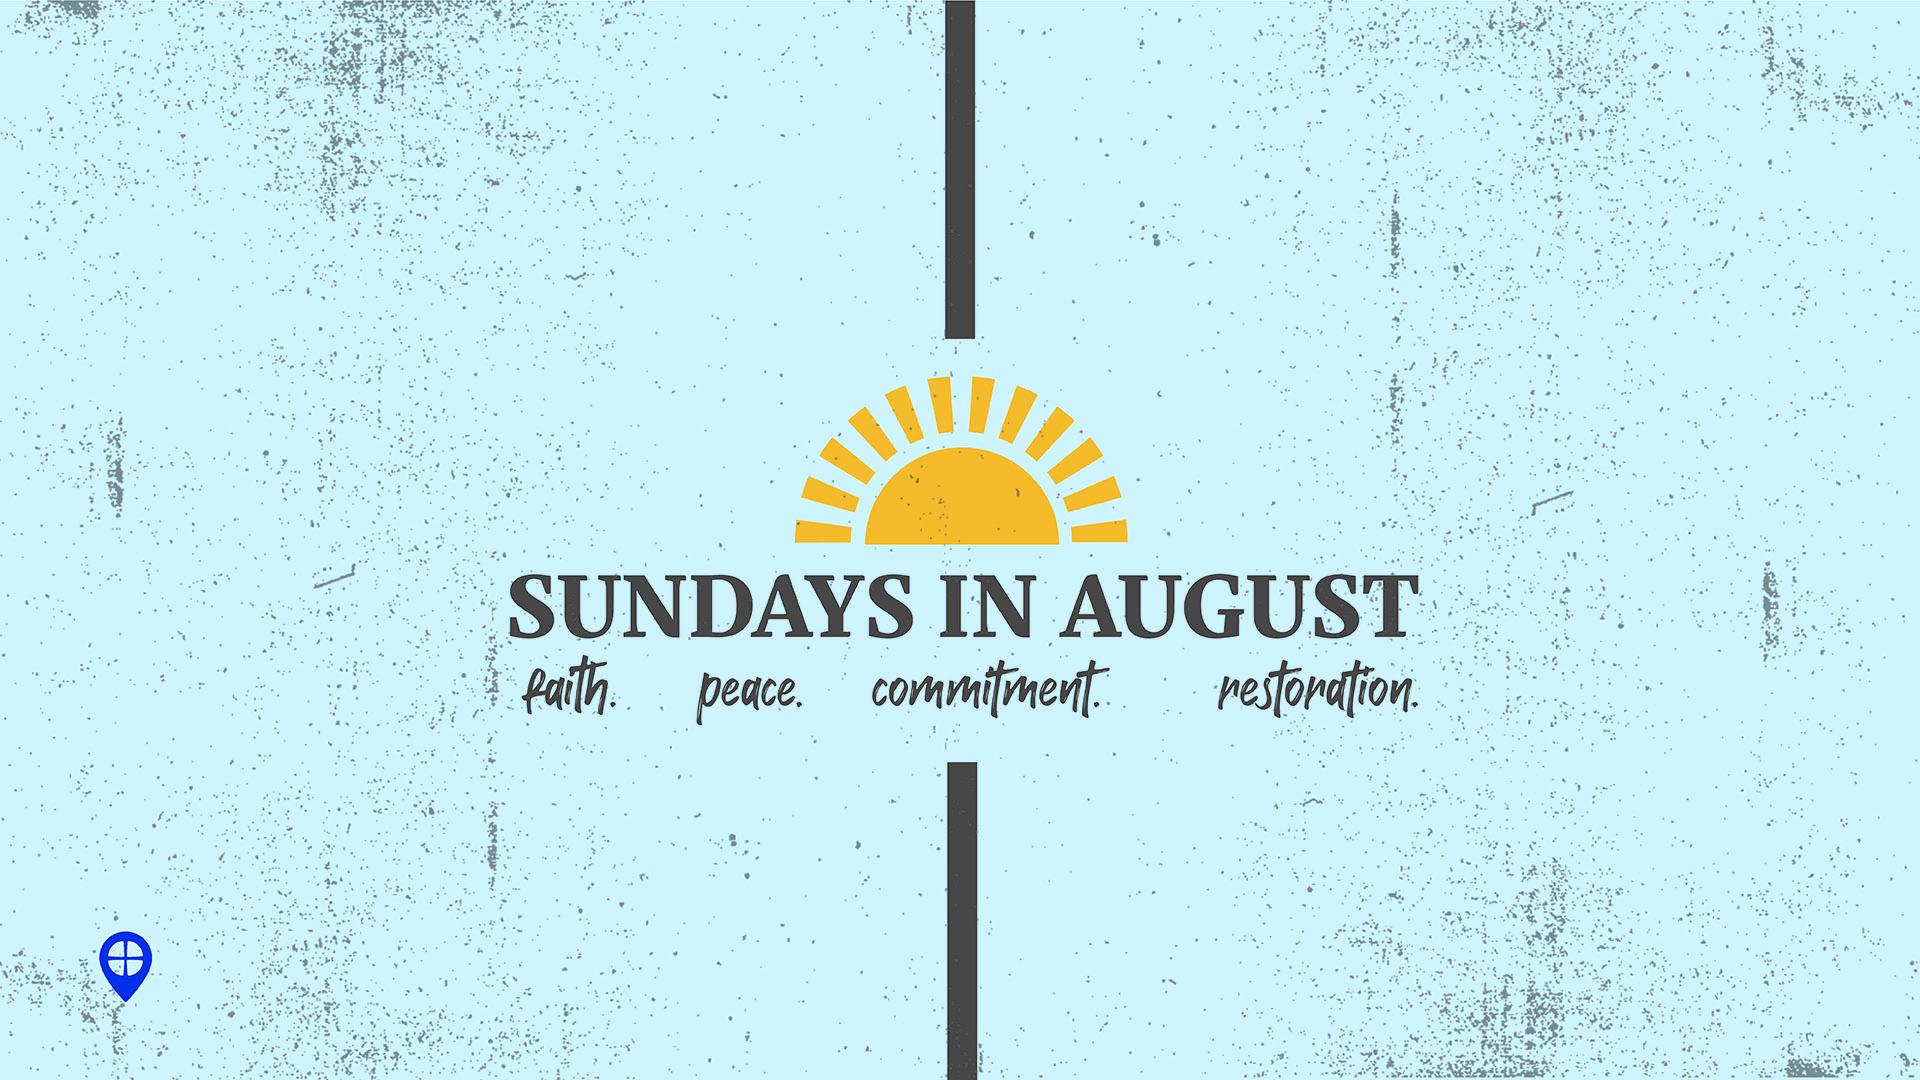 Sundays in August